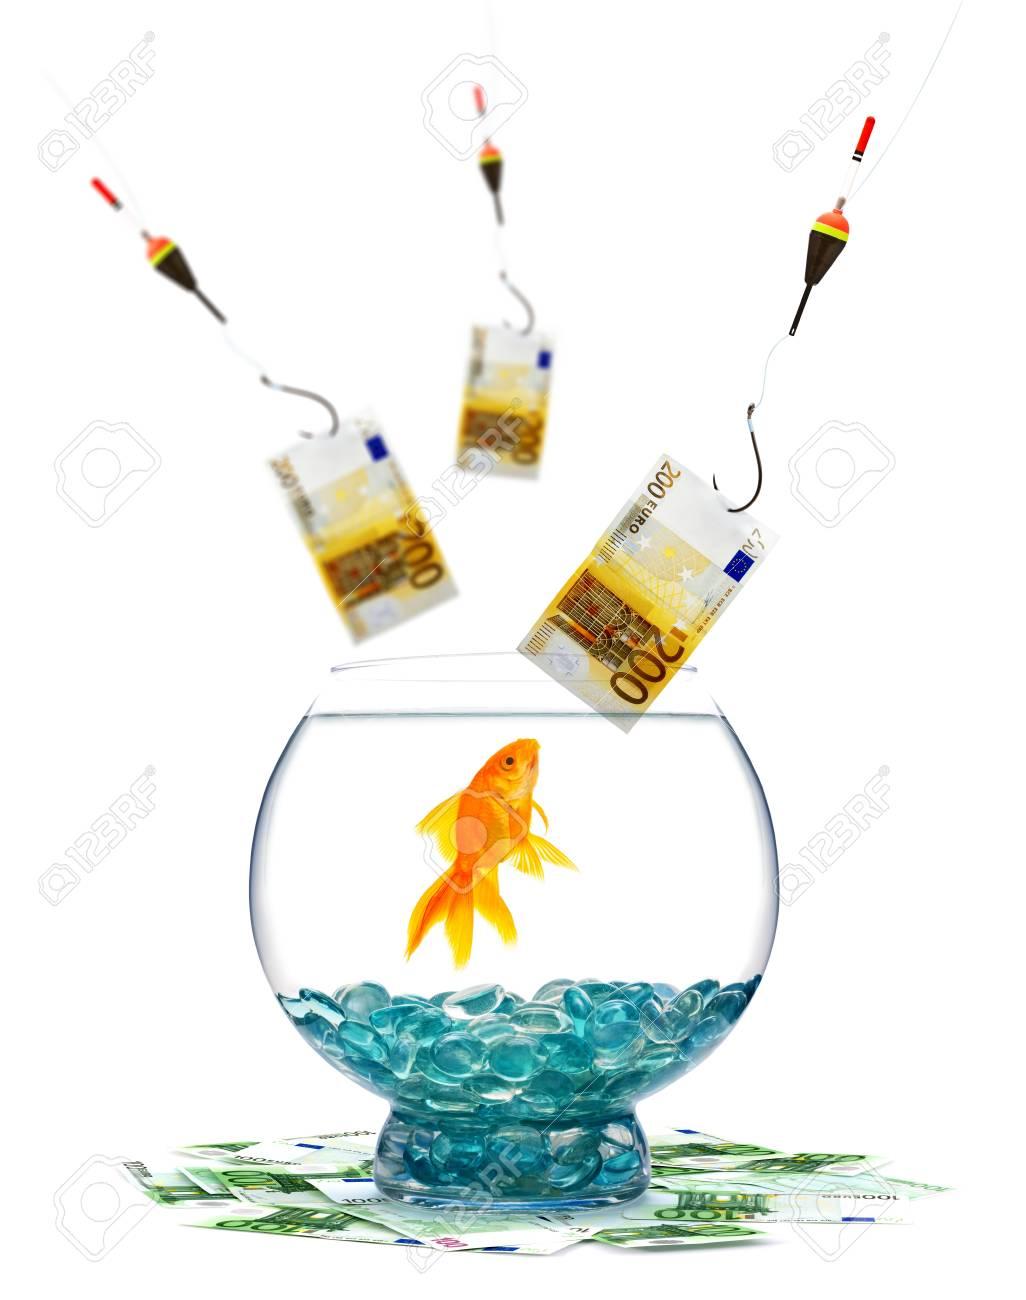 Goldfish in aquarium on white background Stock Photo - 7998310